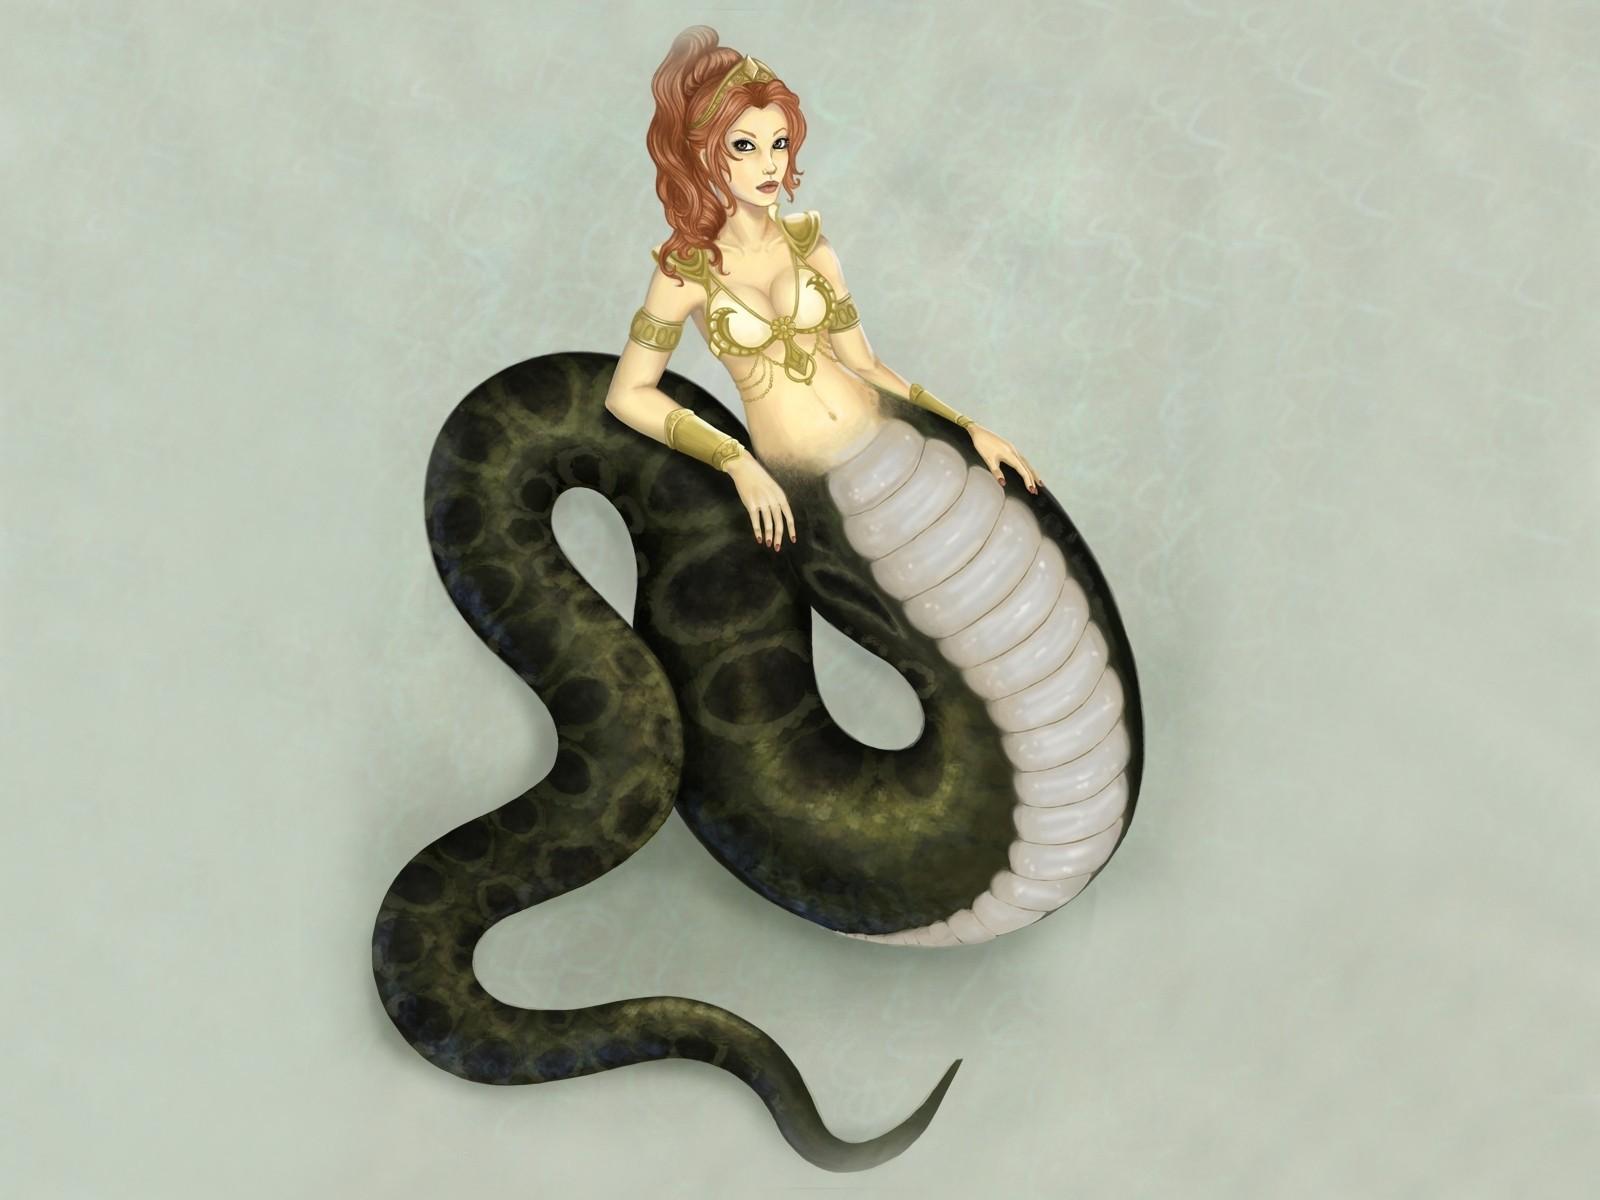 Naga snake woman porn erotic photo